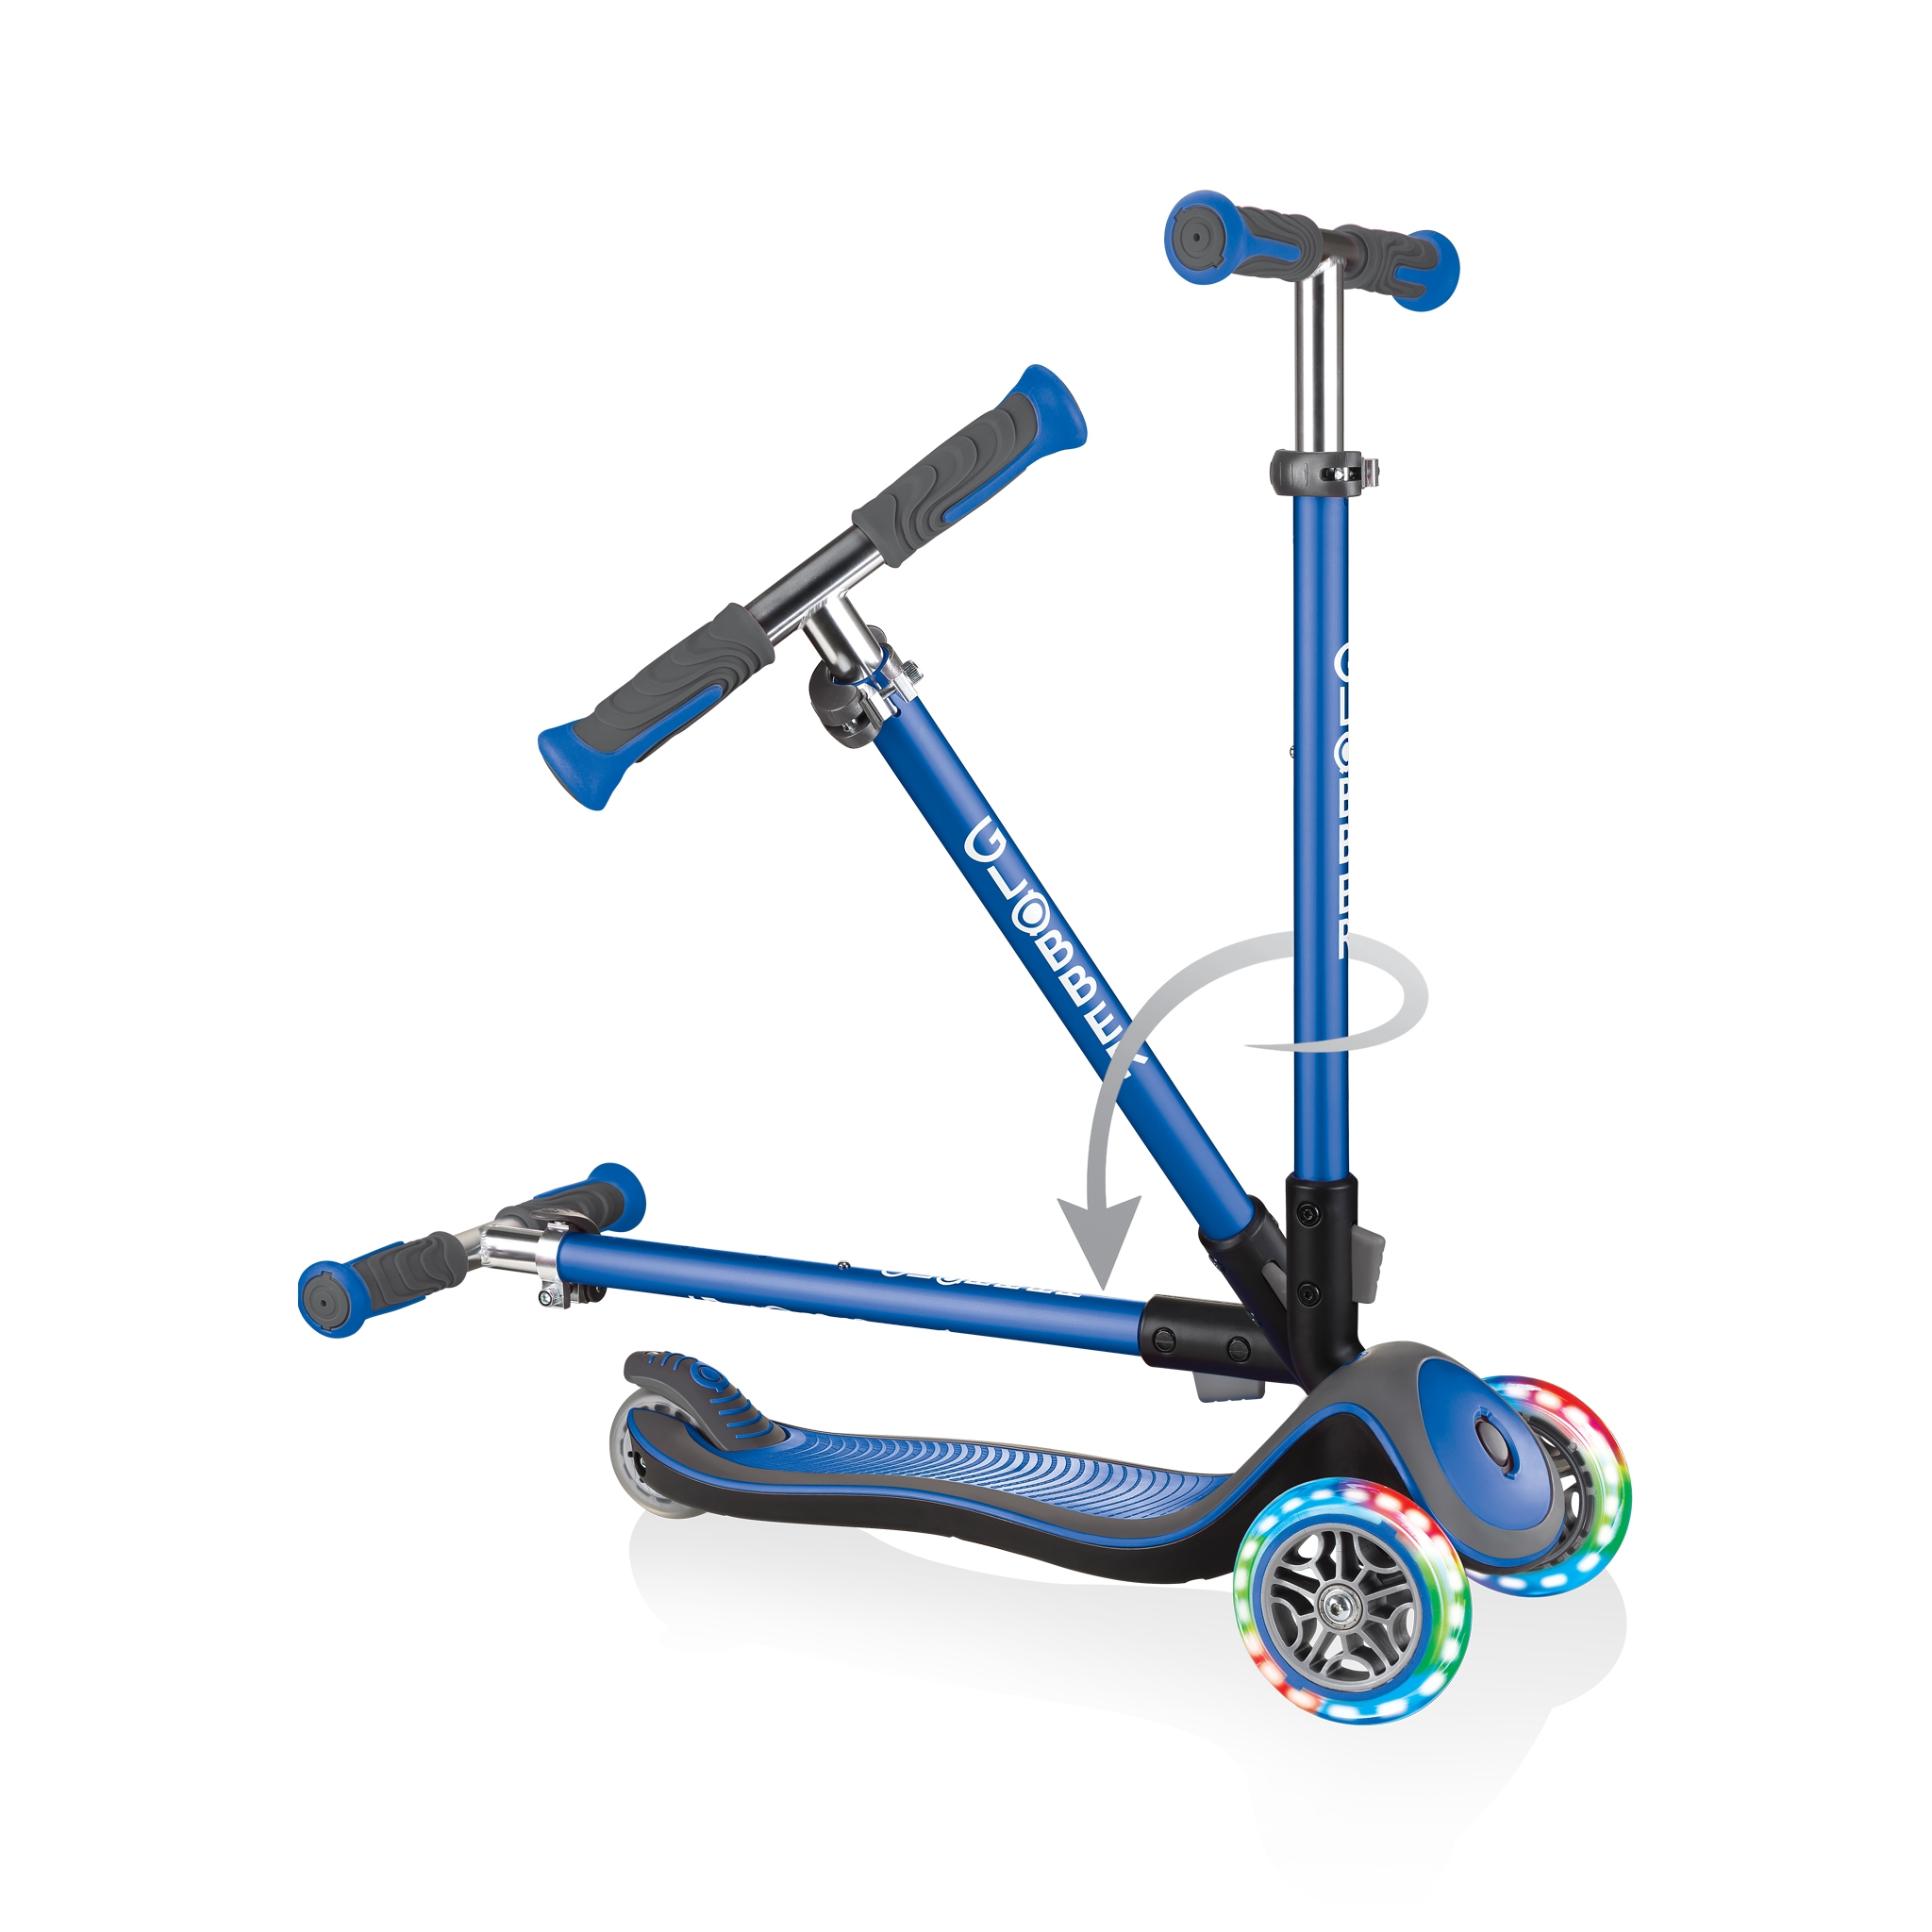 Globber-ELITE-DELUXE-LIGHTS-3-wheel-light-up-scooter-for-kids-fold-up-scooter-navy-blue 2